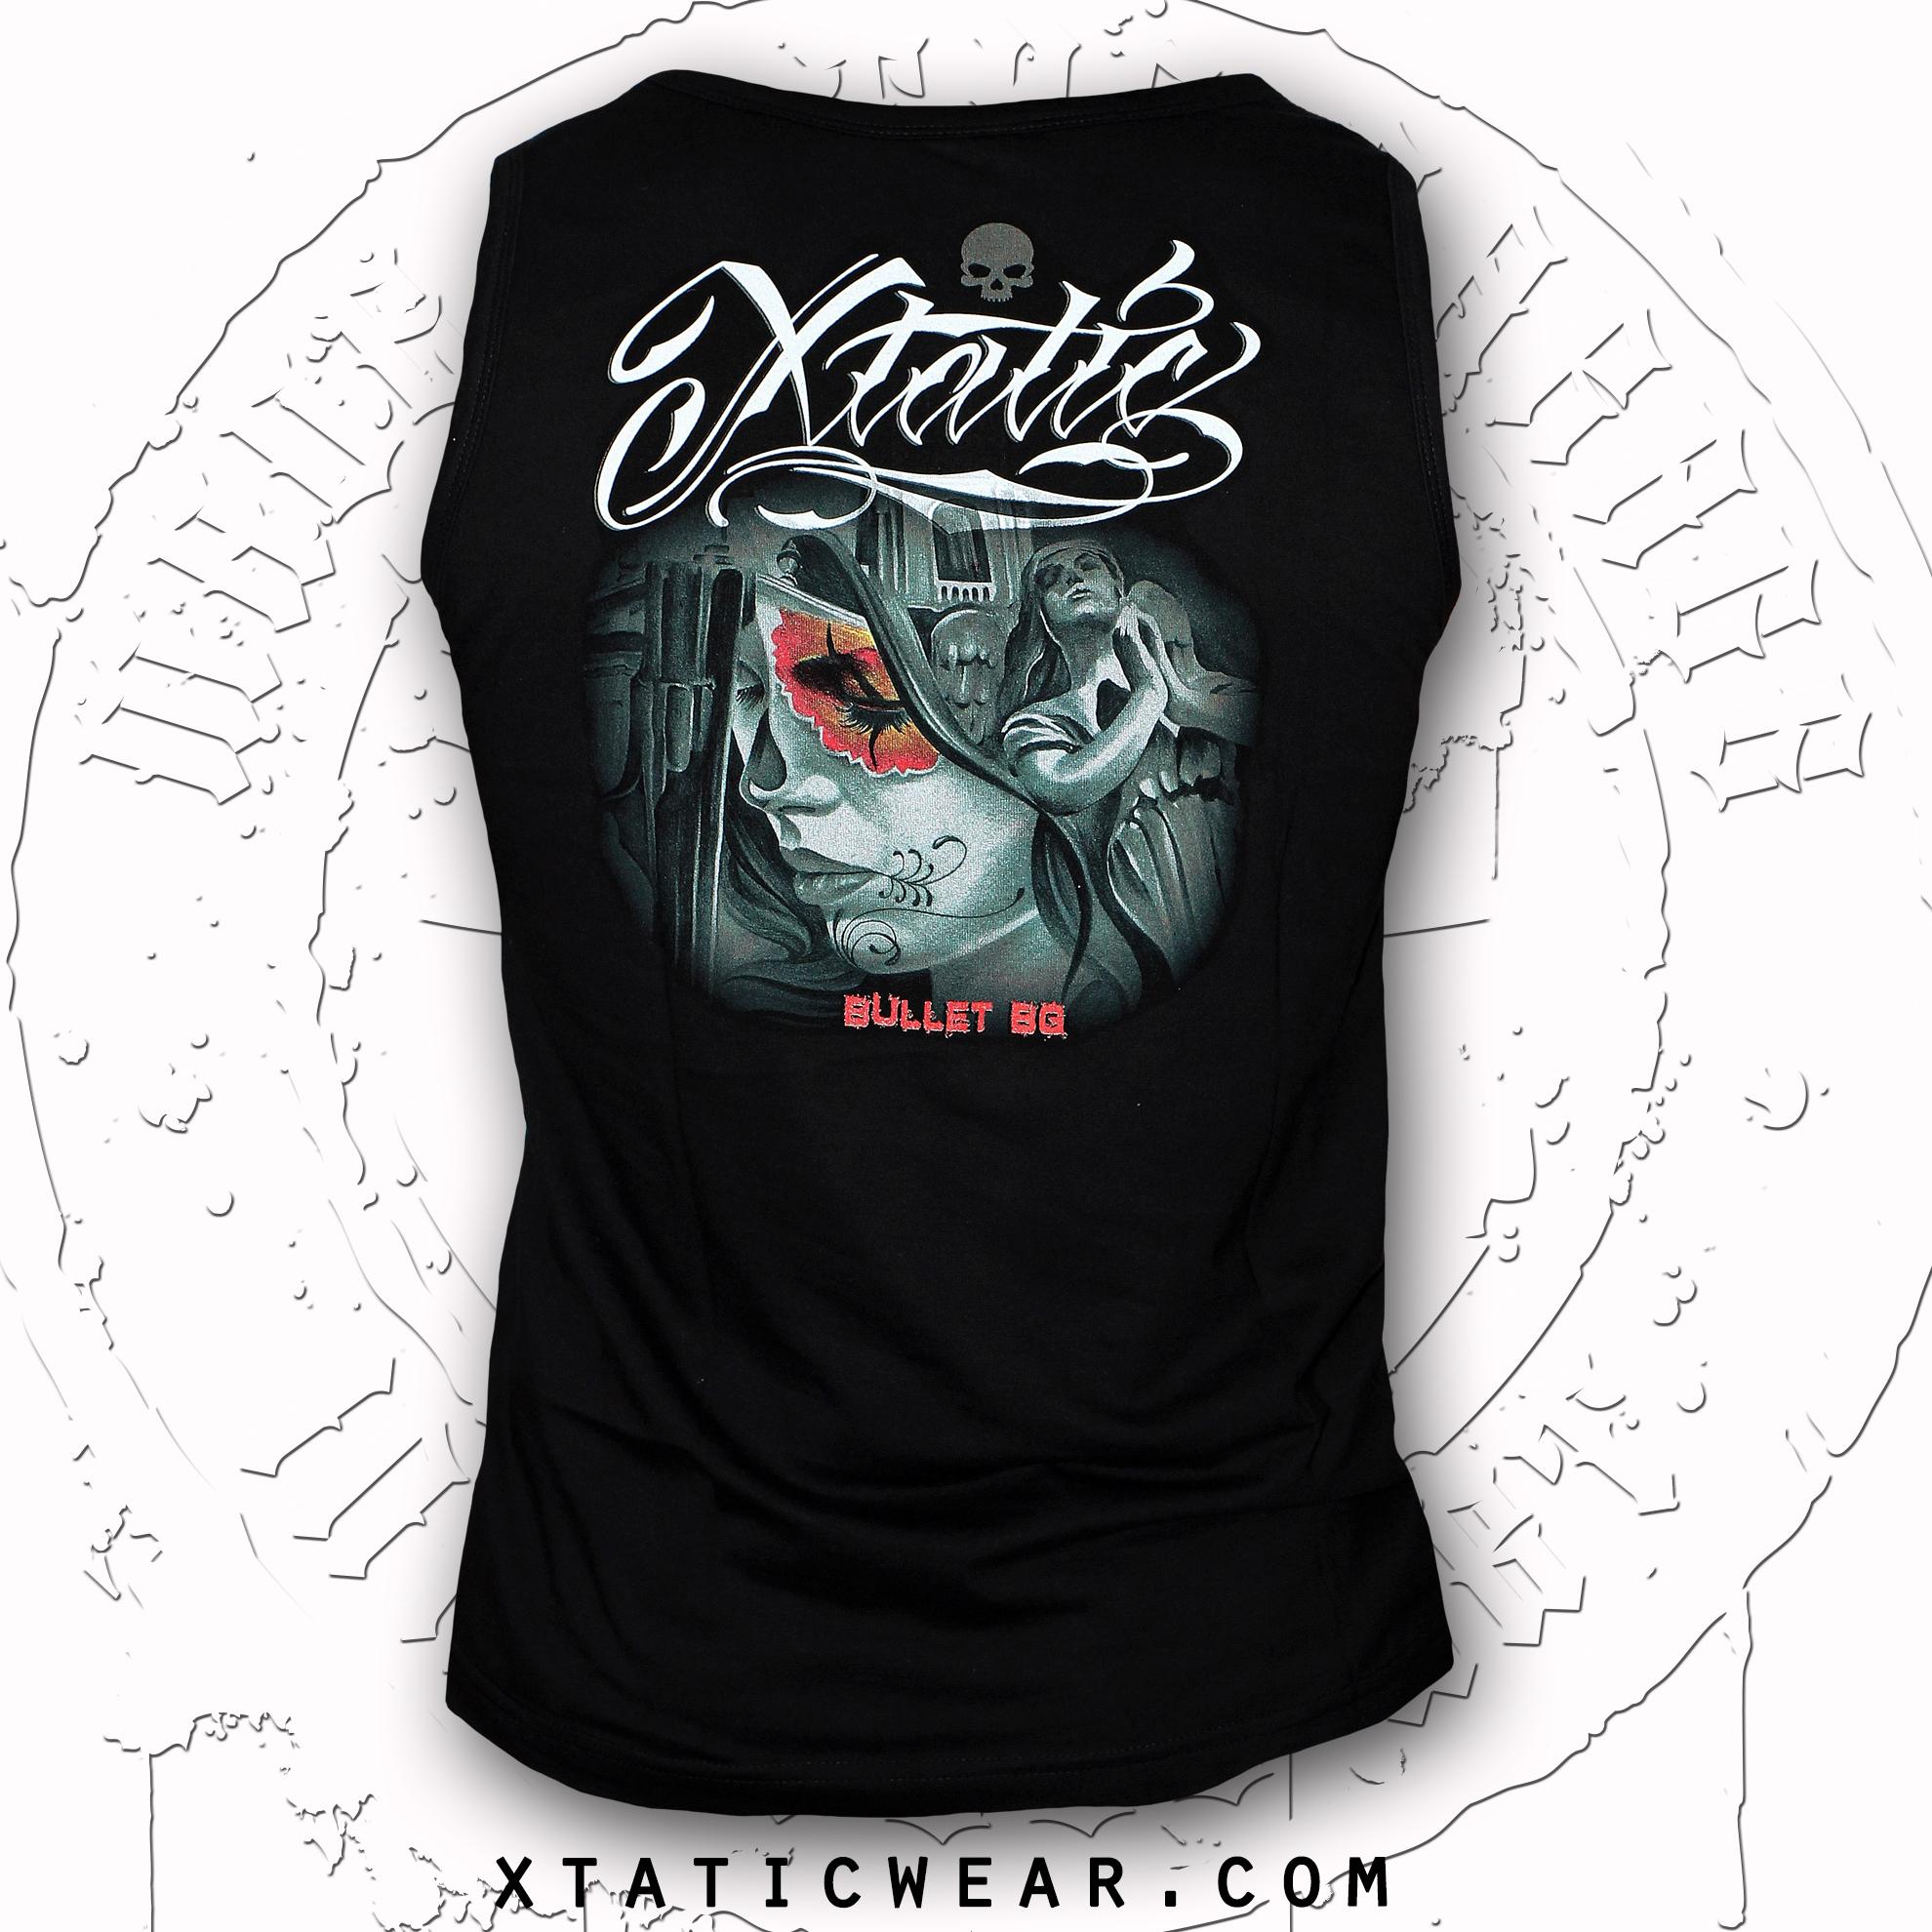 xtatic_wear_bullet_bg_art_tank_top_t_shirts_3.jpg